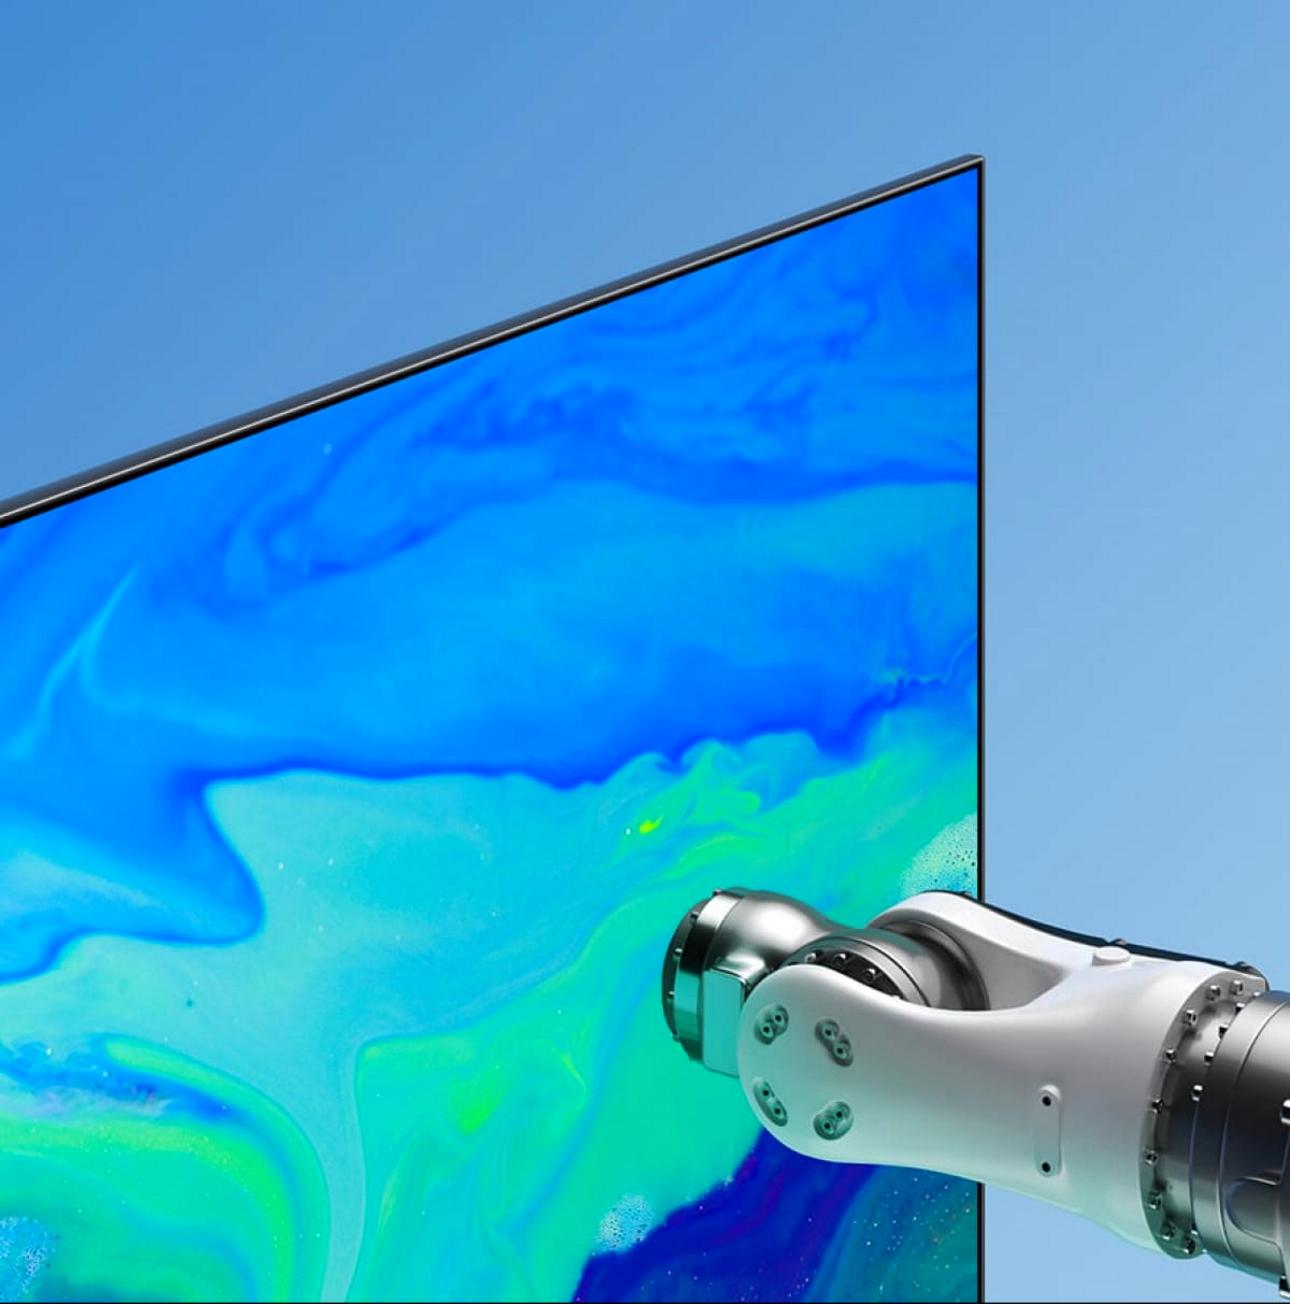 Xiaomi Predstavila Novuyu Linejku Smart Televizorov Mi Tv Ea 2022 3